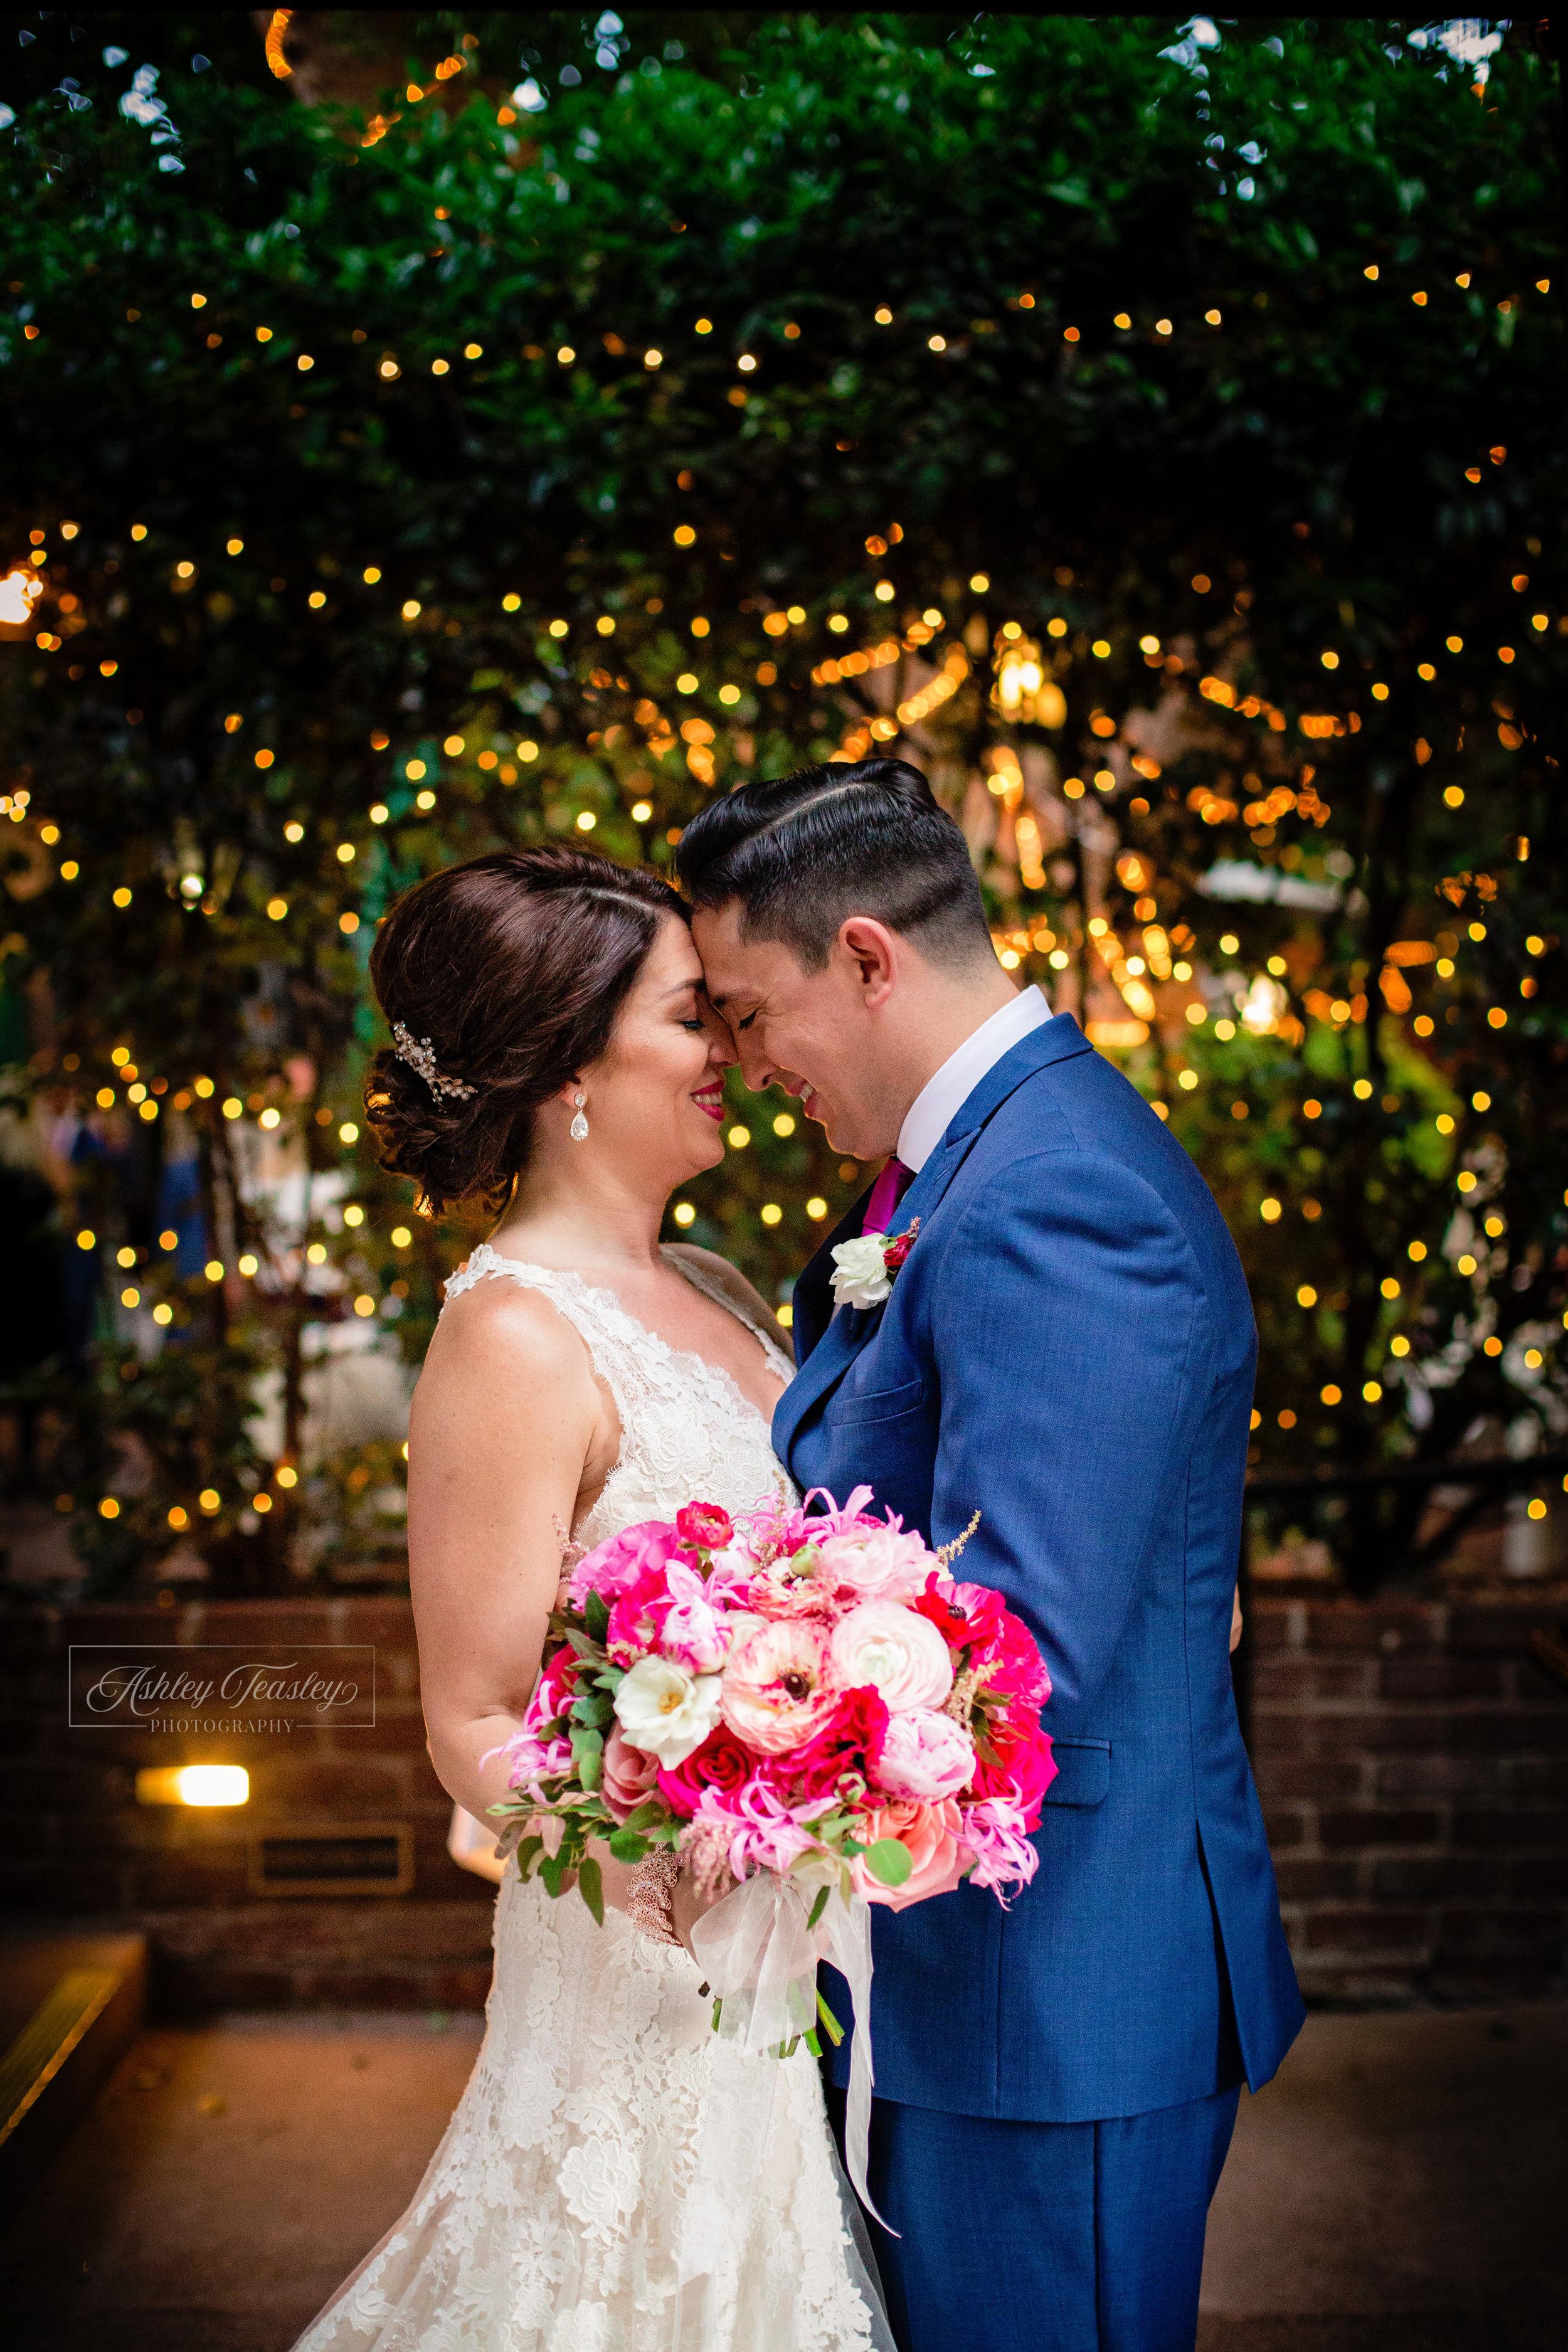 Tarrah & Francisco - The Kimpton Sawyer Hotel - The Firehouse Old Sac - Sacramento Wedding Photographer - Ashley Teasley Photography (37 of 118).jpg